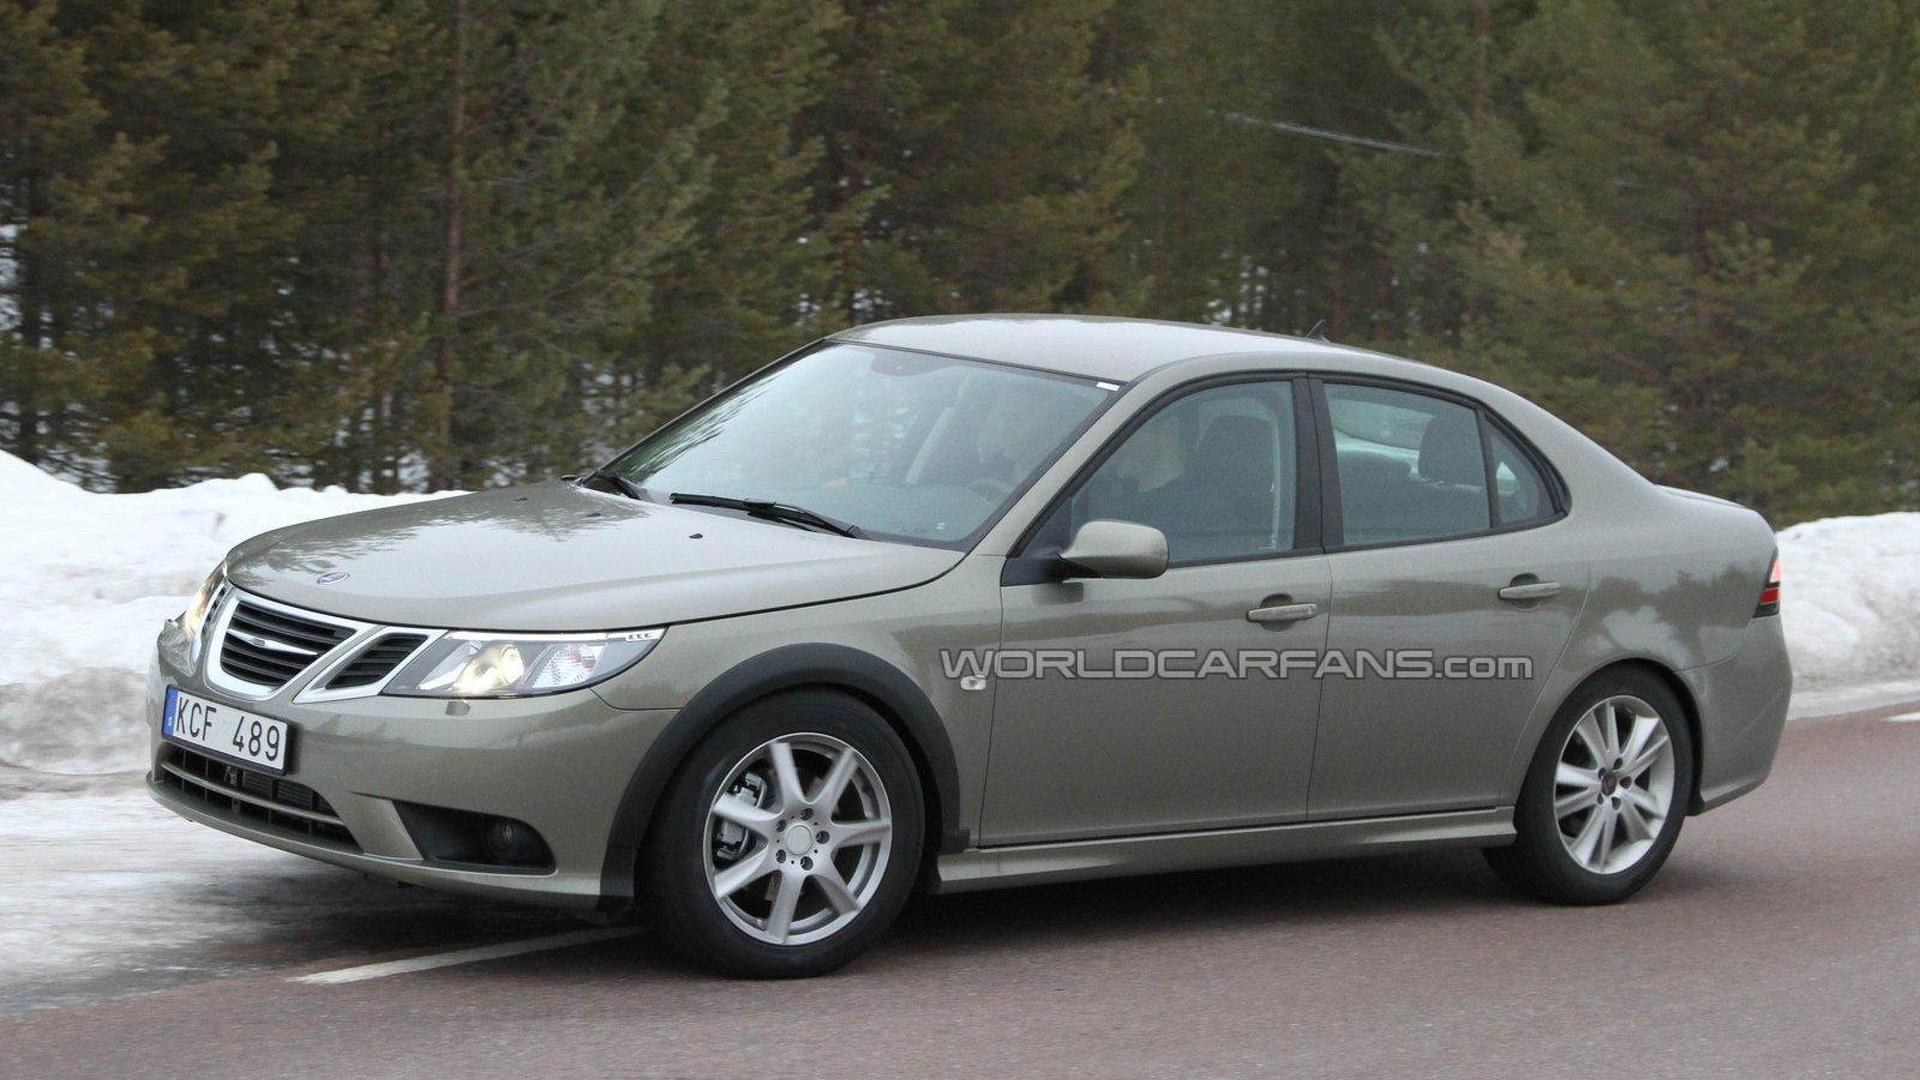 2012 Saab 9-3 test mule spied again